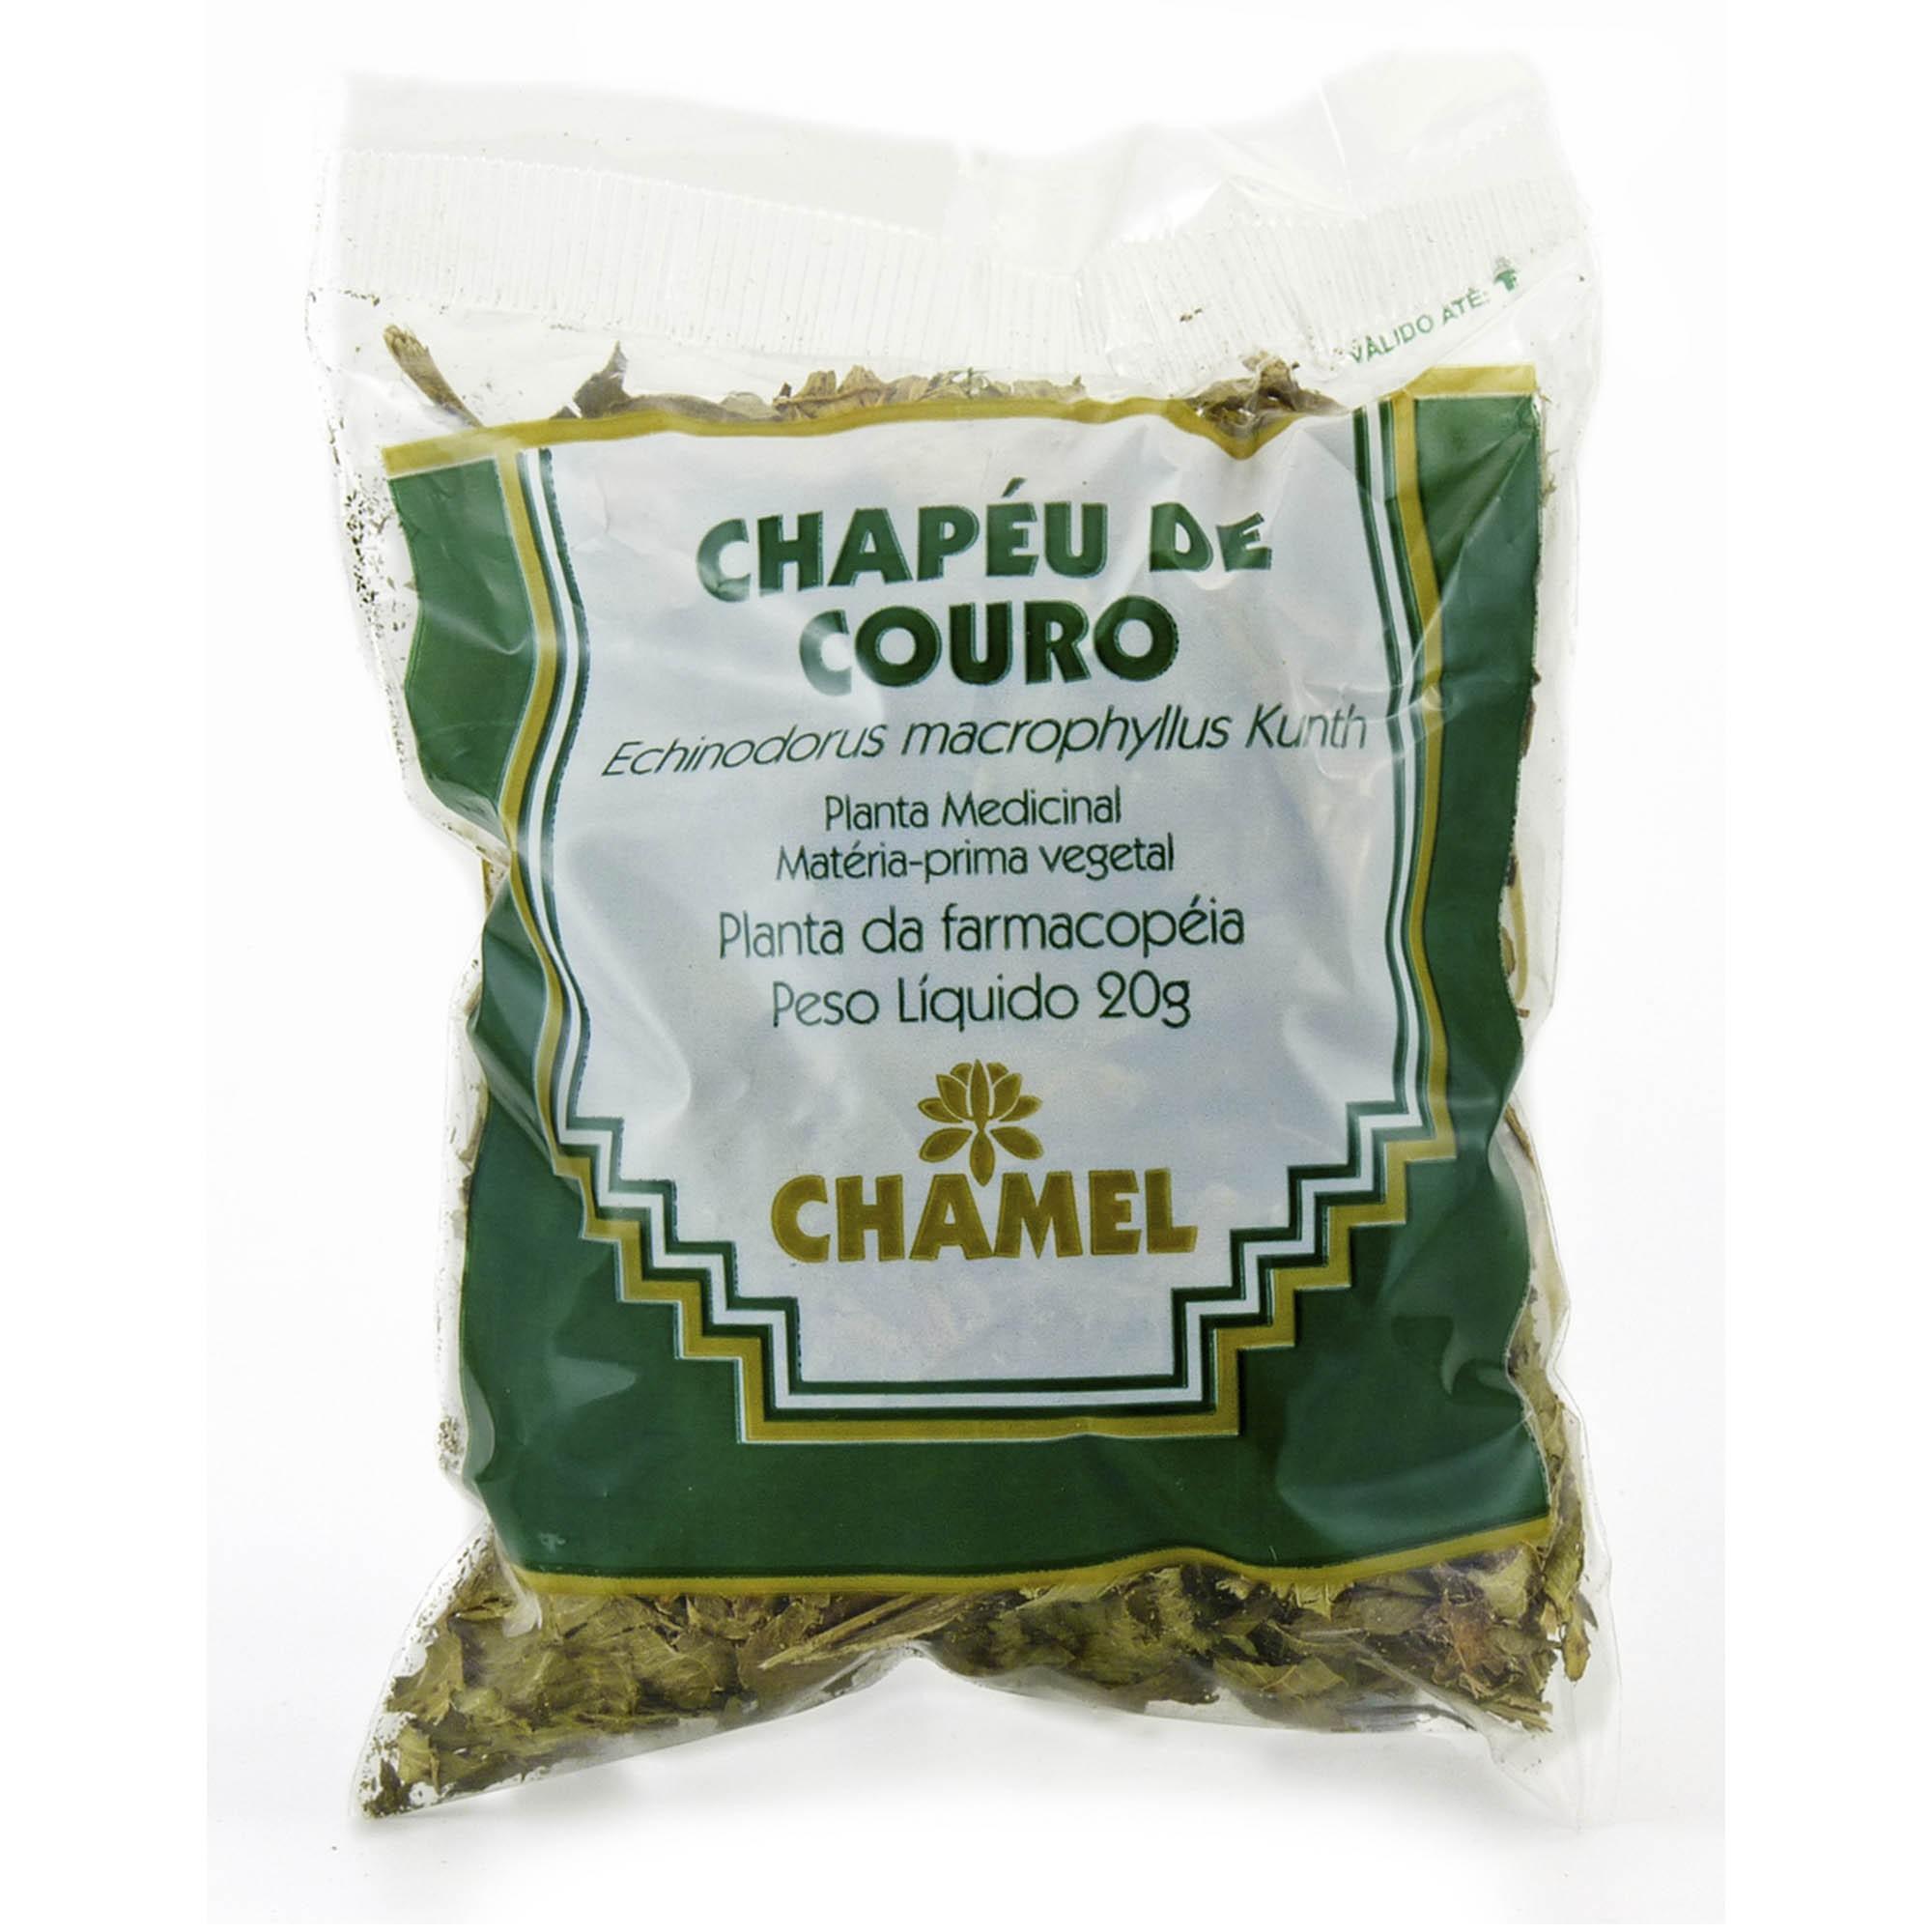 Chapéu de Couro 20g Chamel - Chá-Folhas